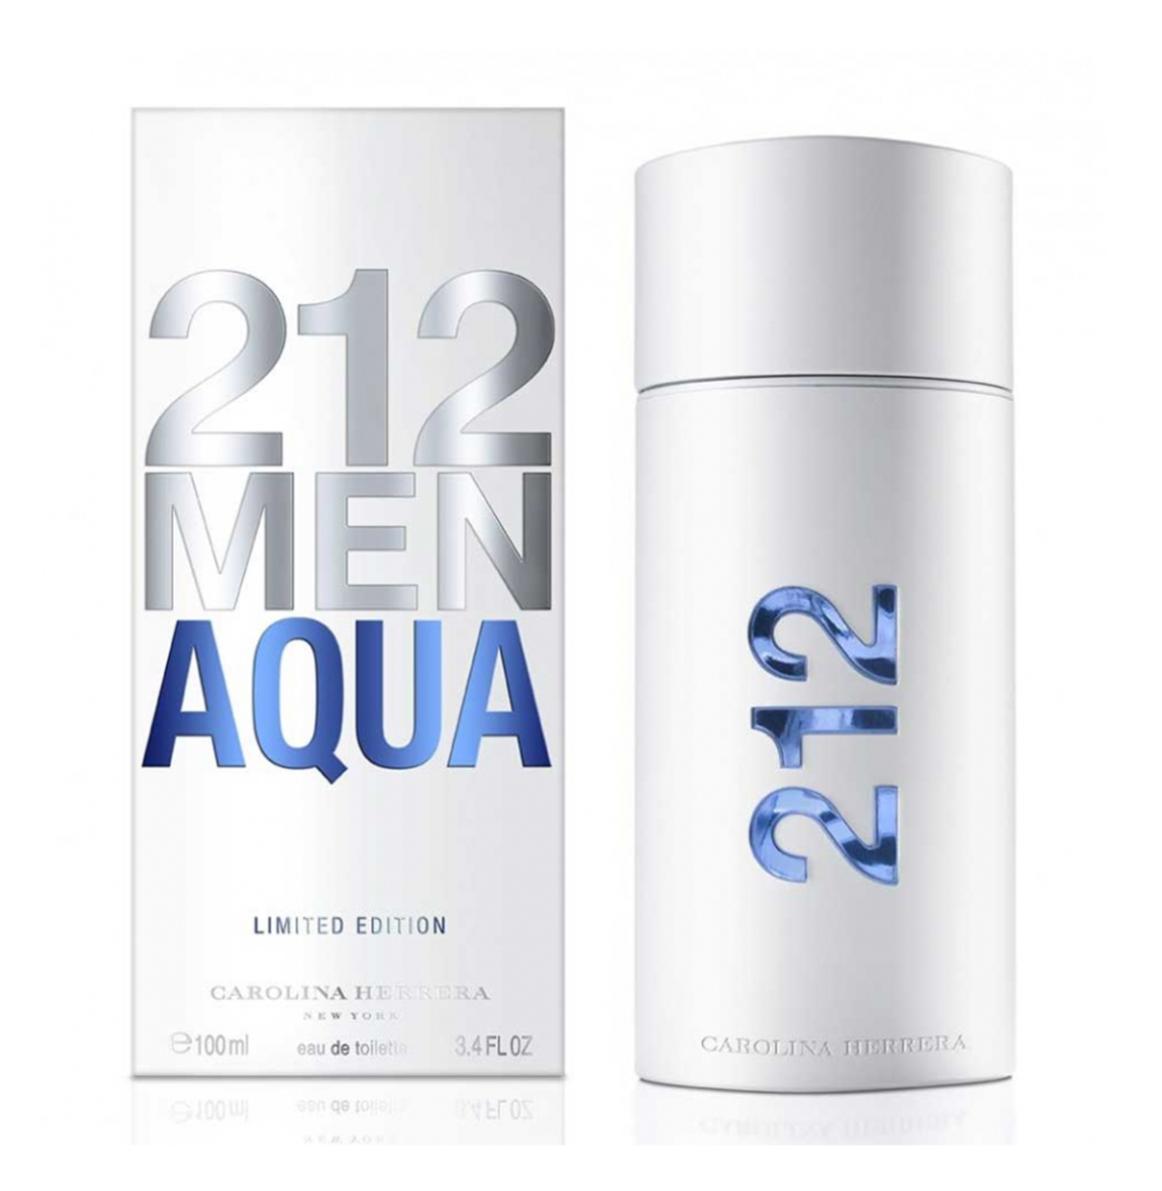 Carolina Herrera - 212 Men Aqua - Eau de Toilette para homem, perfume men  aqua, perfume 212, 212 men aqua  perfume  carolinaherrera  portorico 43185b450d